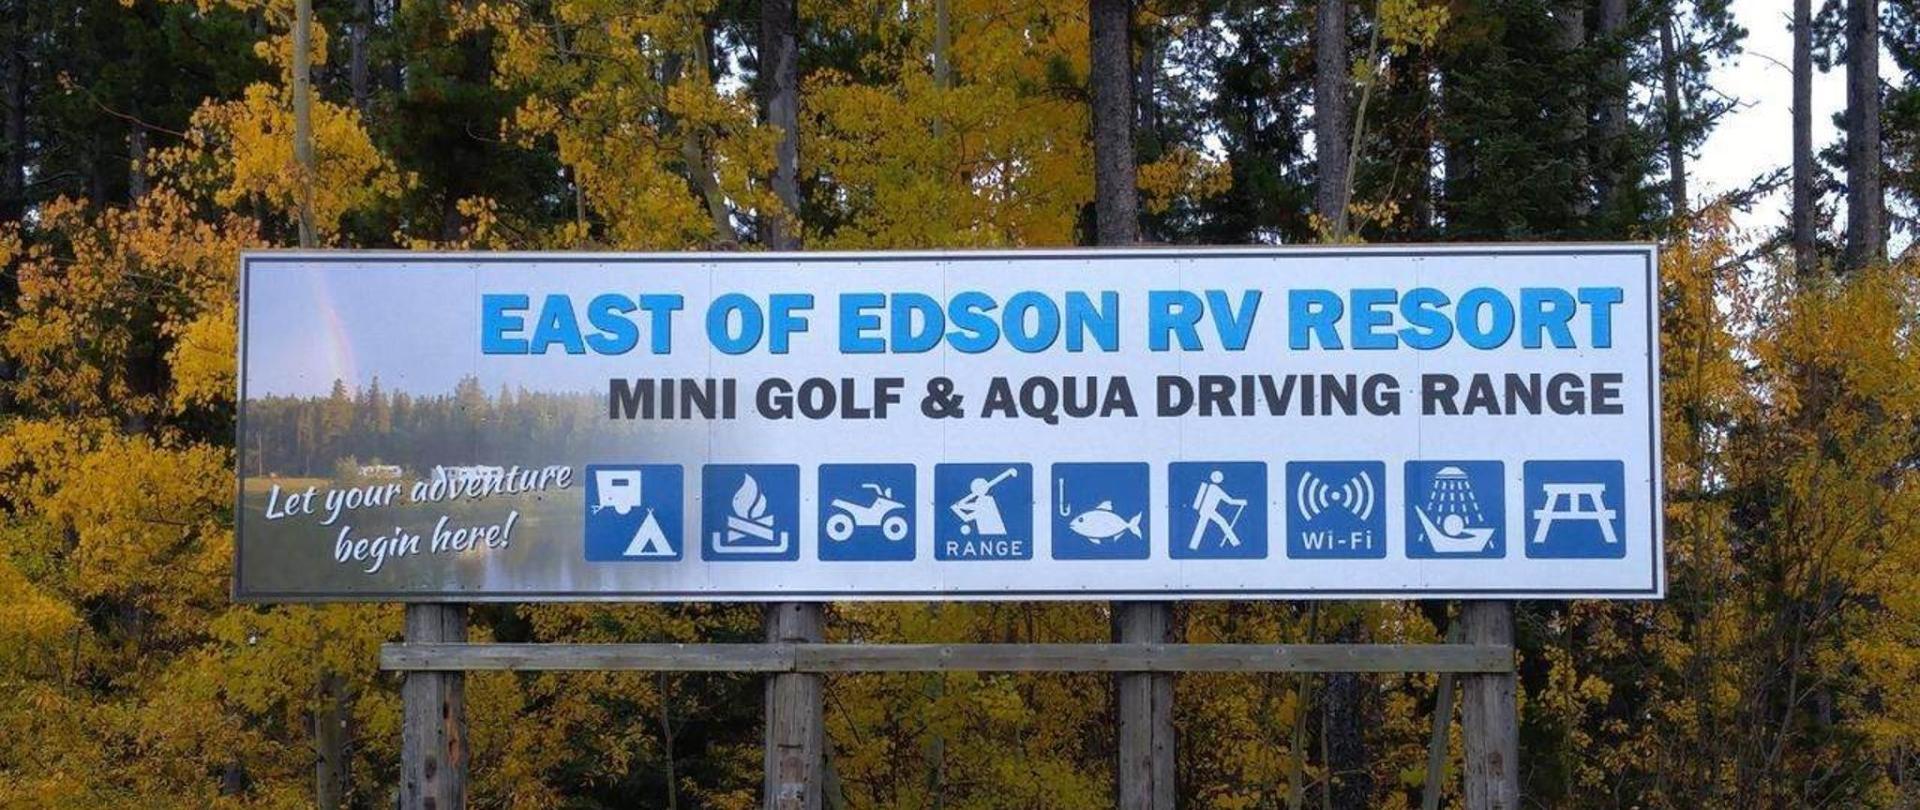 East of Edson RV Resort